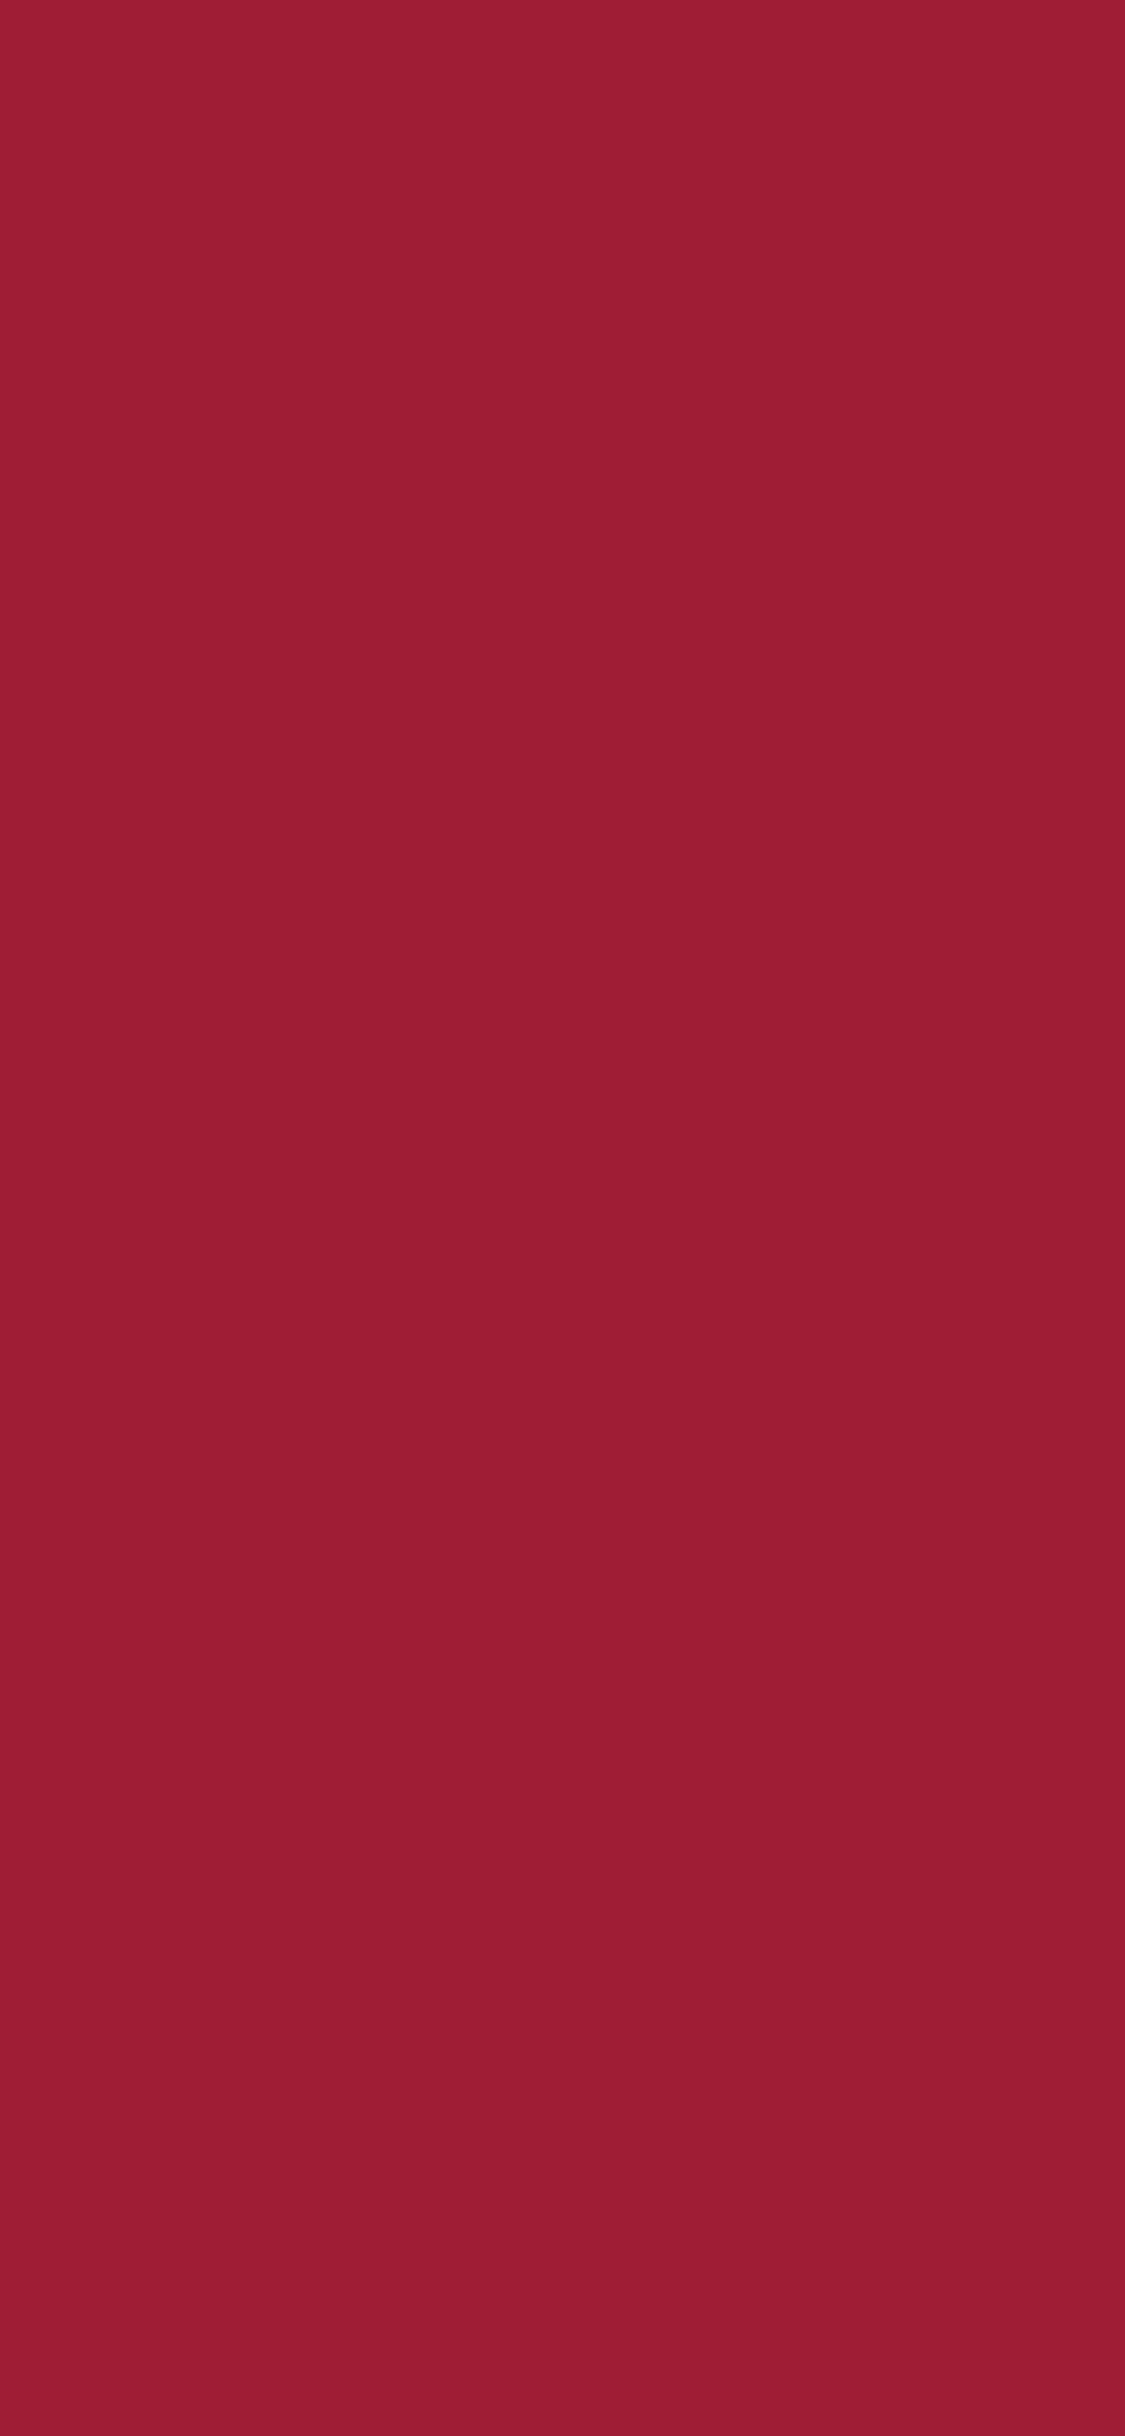 1125x2436 Vivid Burgundy Solid Color Background